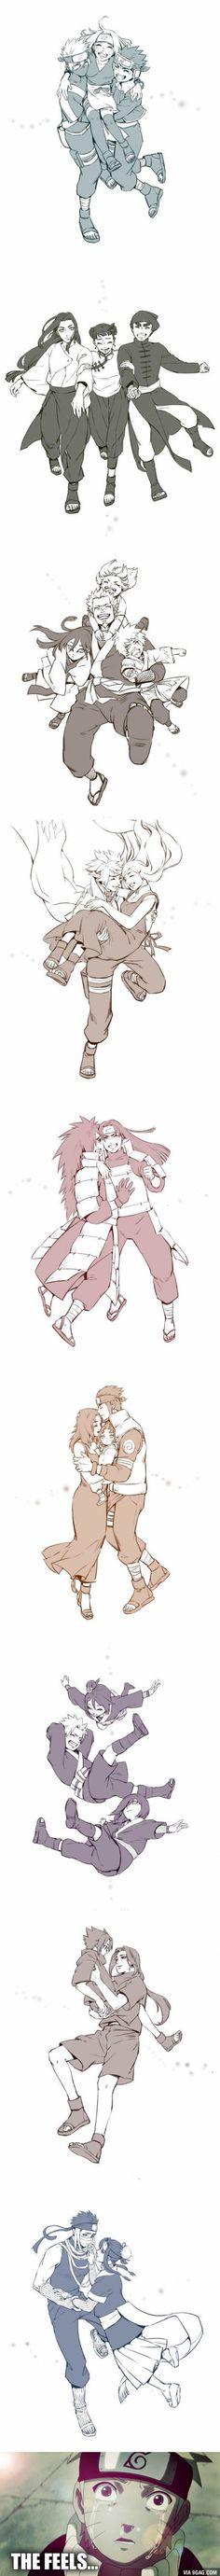 Fan Artist reimagines happy ending for tragic Naruto characters (By Black Marlboro) Más イタチ と サスケ. Kakashi, Naruto Shippuden Anime, Sarada Uchiha, Gaara, Manga Anime, Anime Naruto, Naruto And Sasuke, Naruto Funny, Tamako Love Story